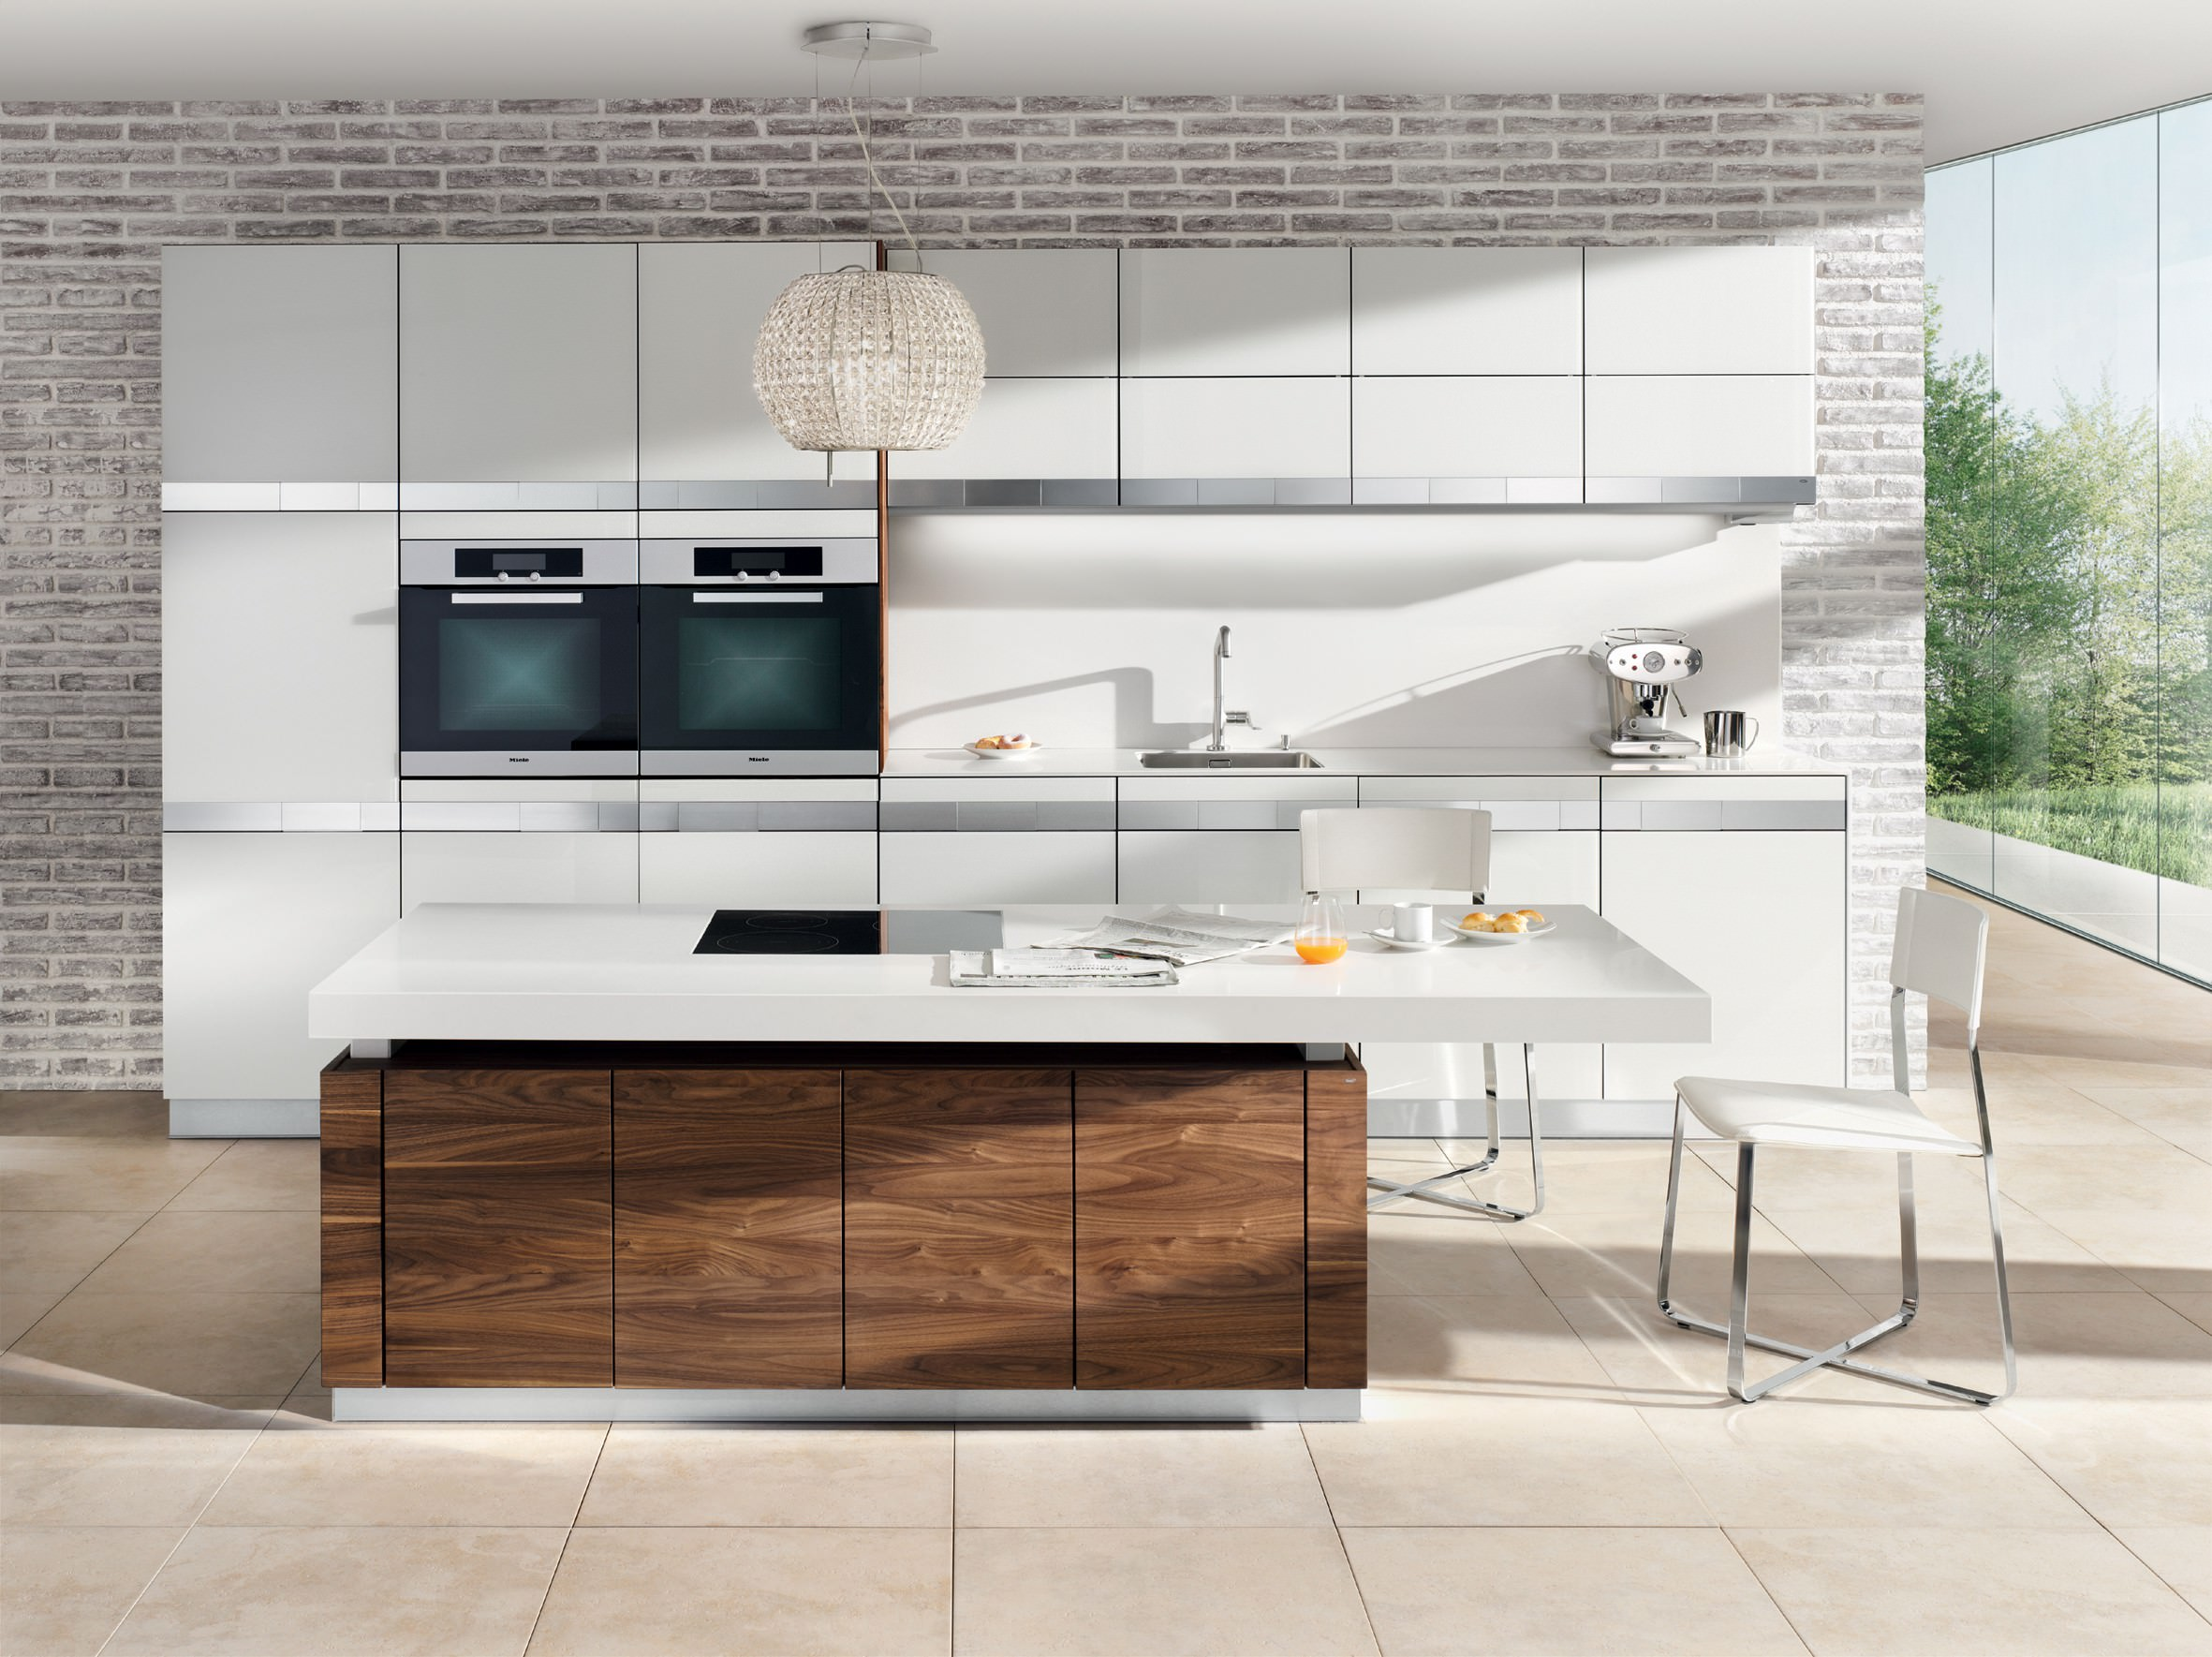 Célèbre Altezza Piano Cucina. Affordable Sgabelli Alzabili Garret Posti Ad  OX86